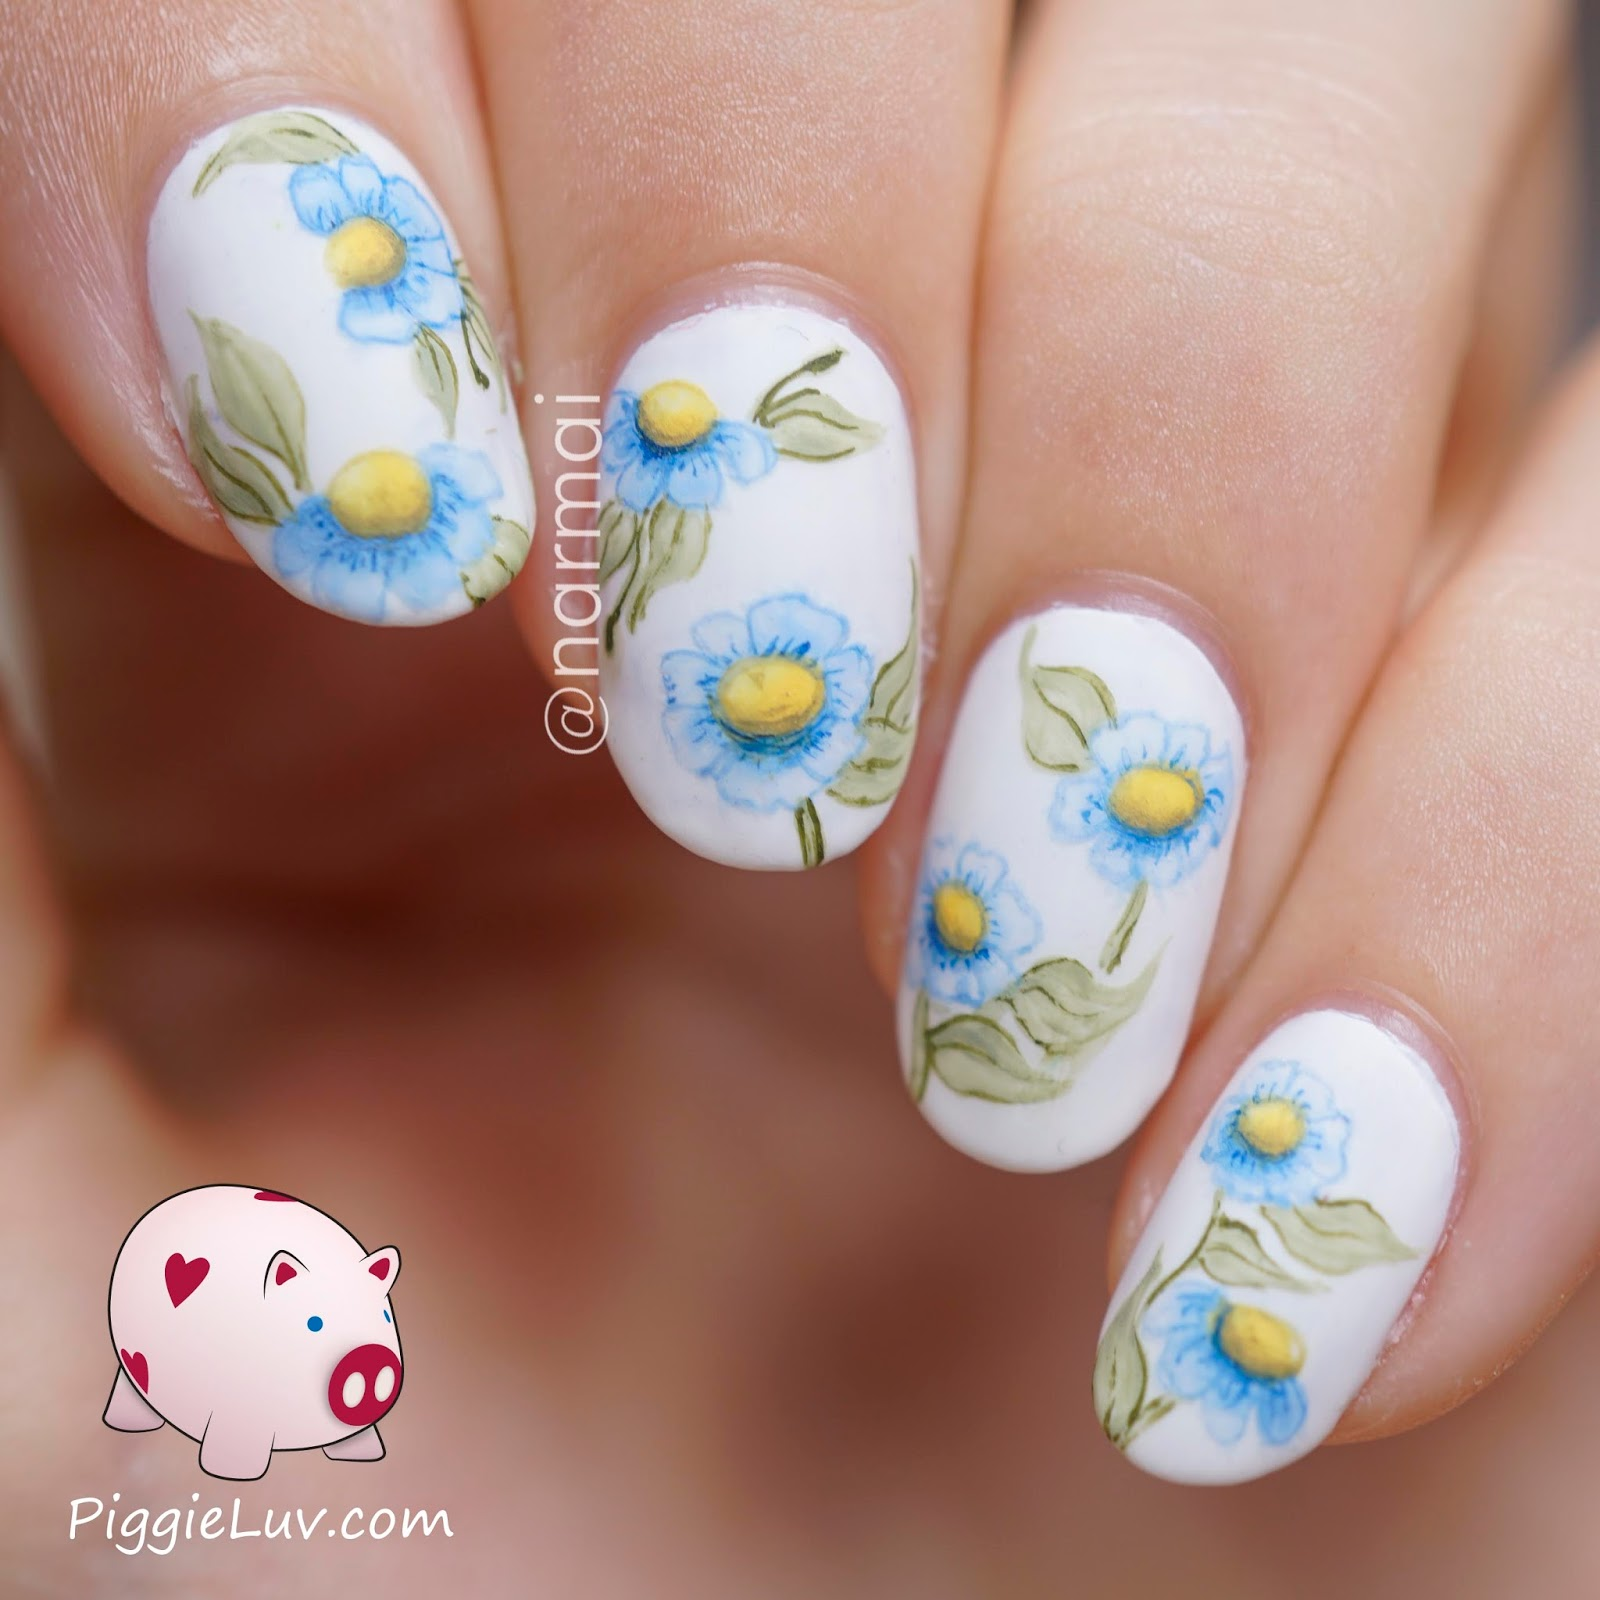 Piggieluv May Flowers Nail Art Hpb Linkup